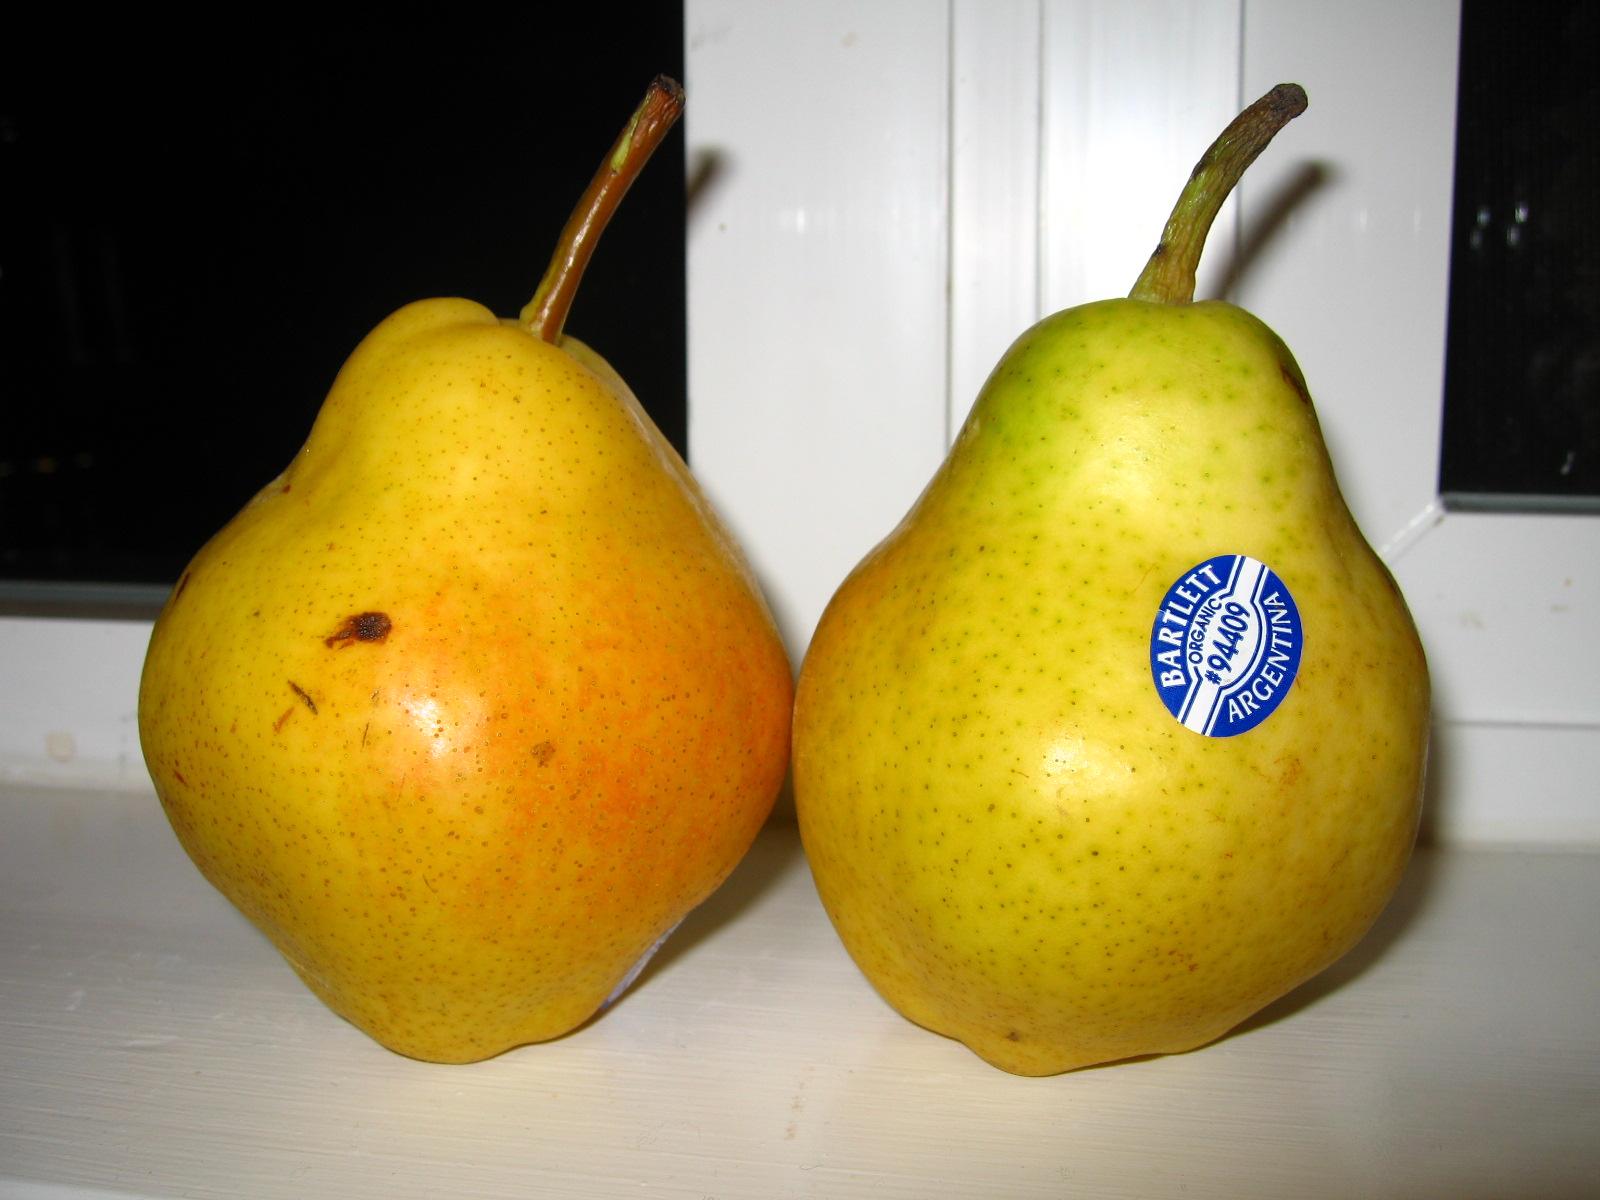 [Pear]